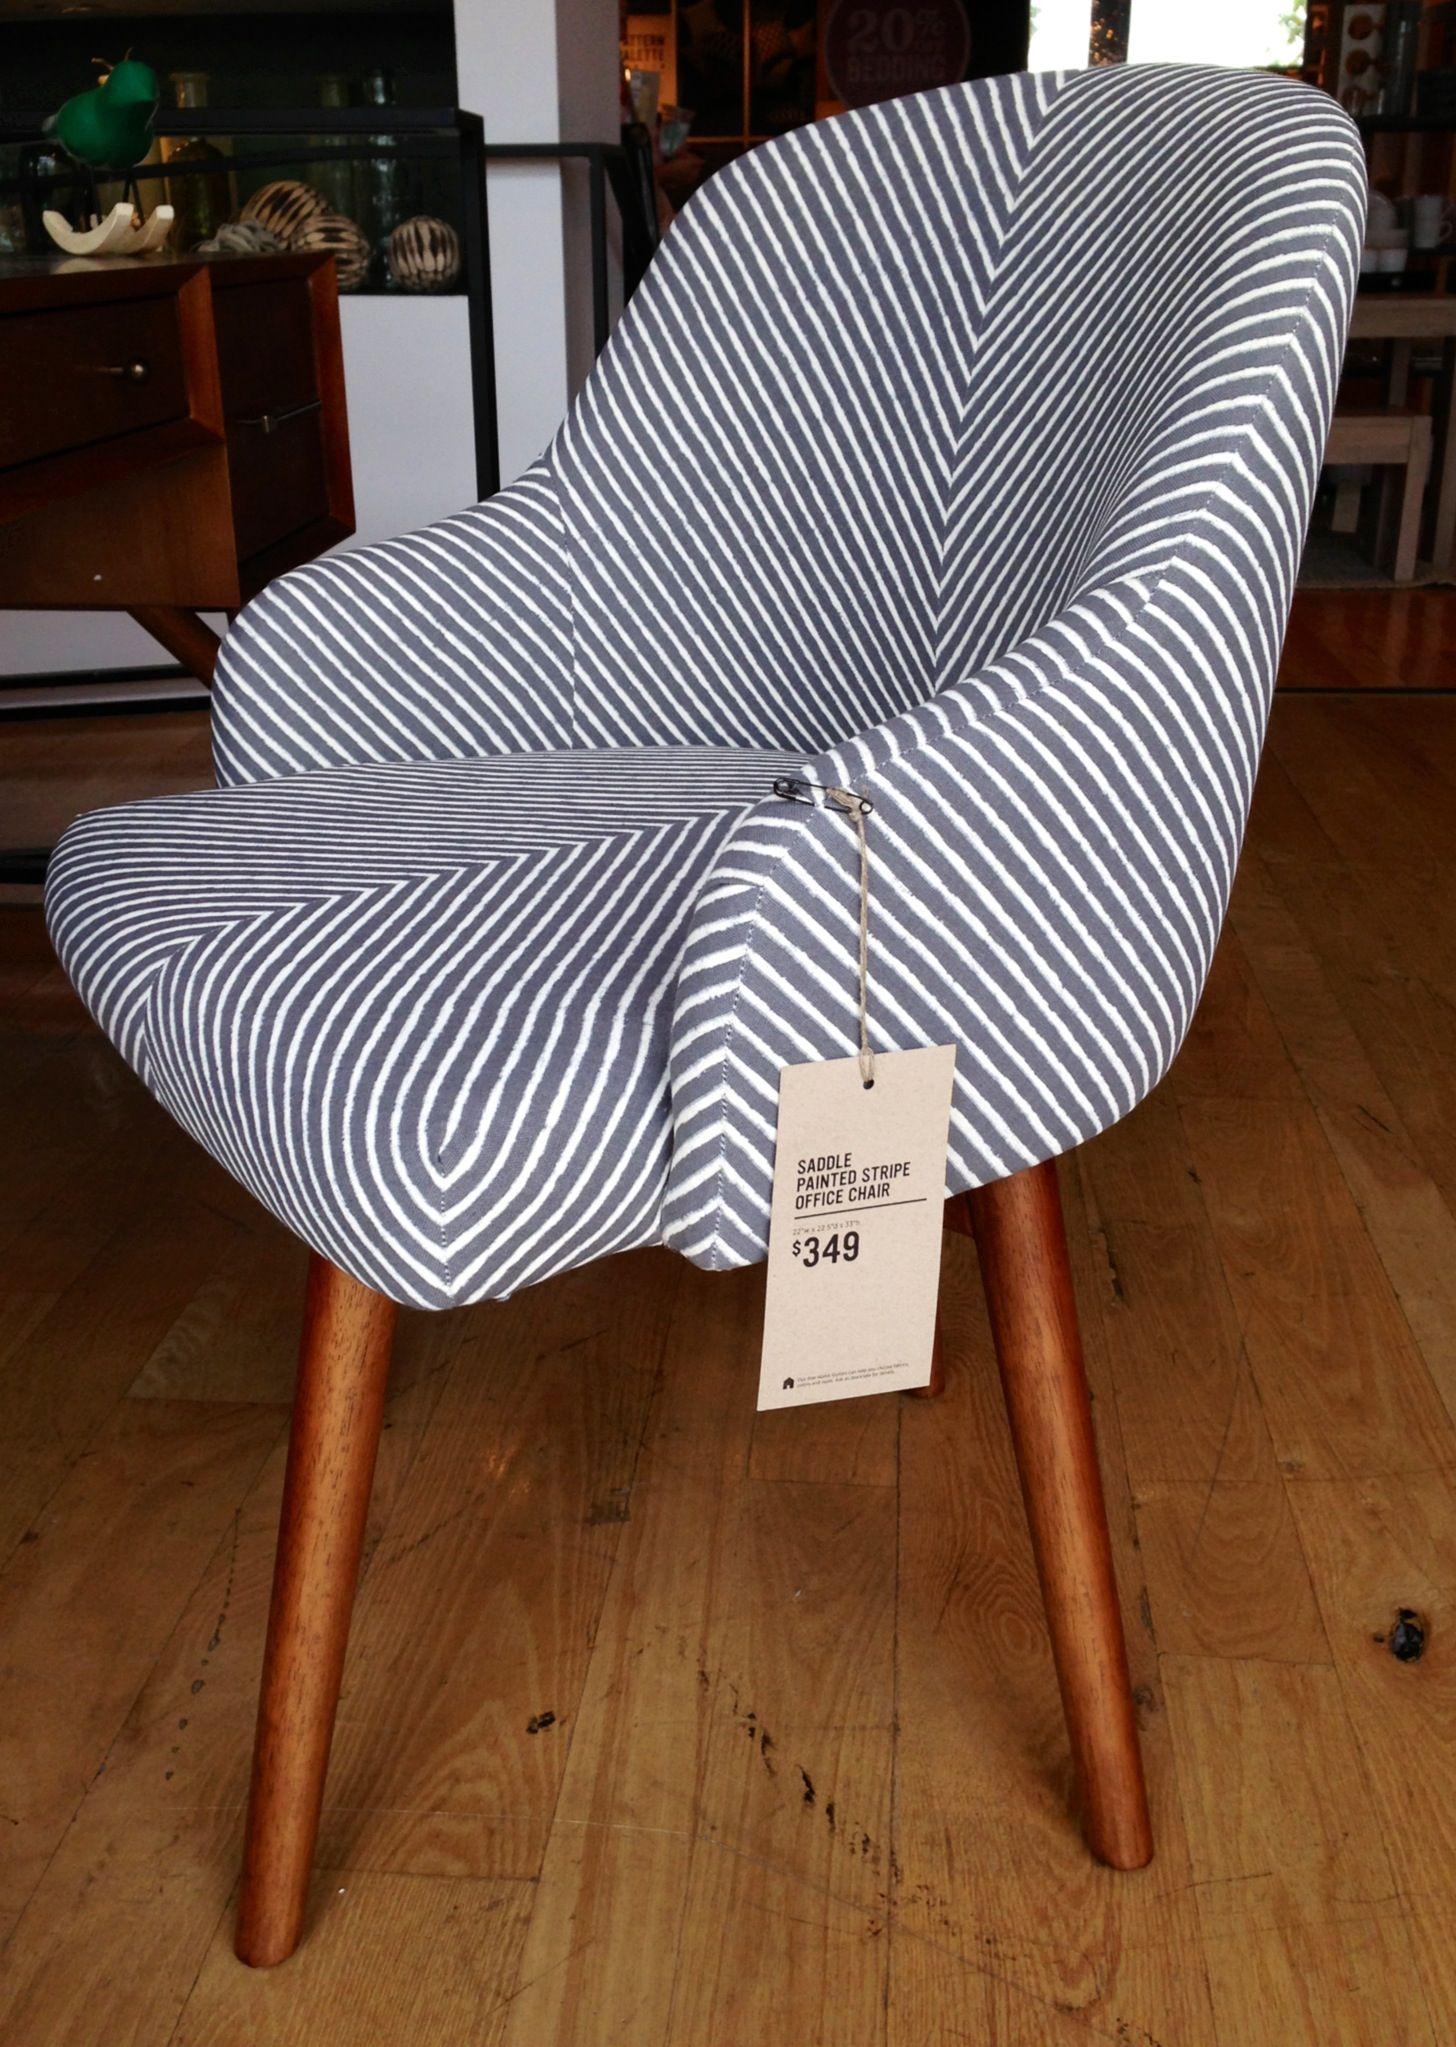 stunning west elm office chair | West Elm office chair, want it. | Home office chairs, West ...